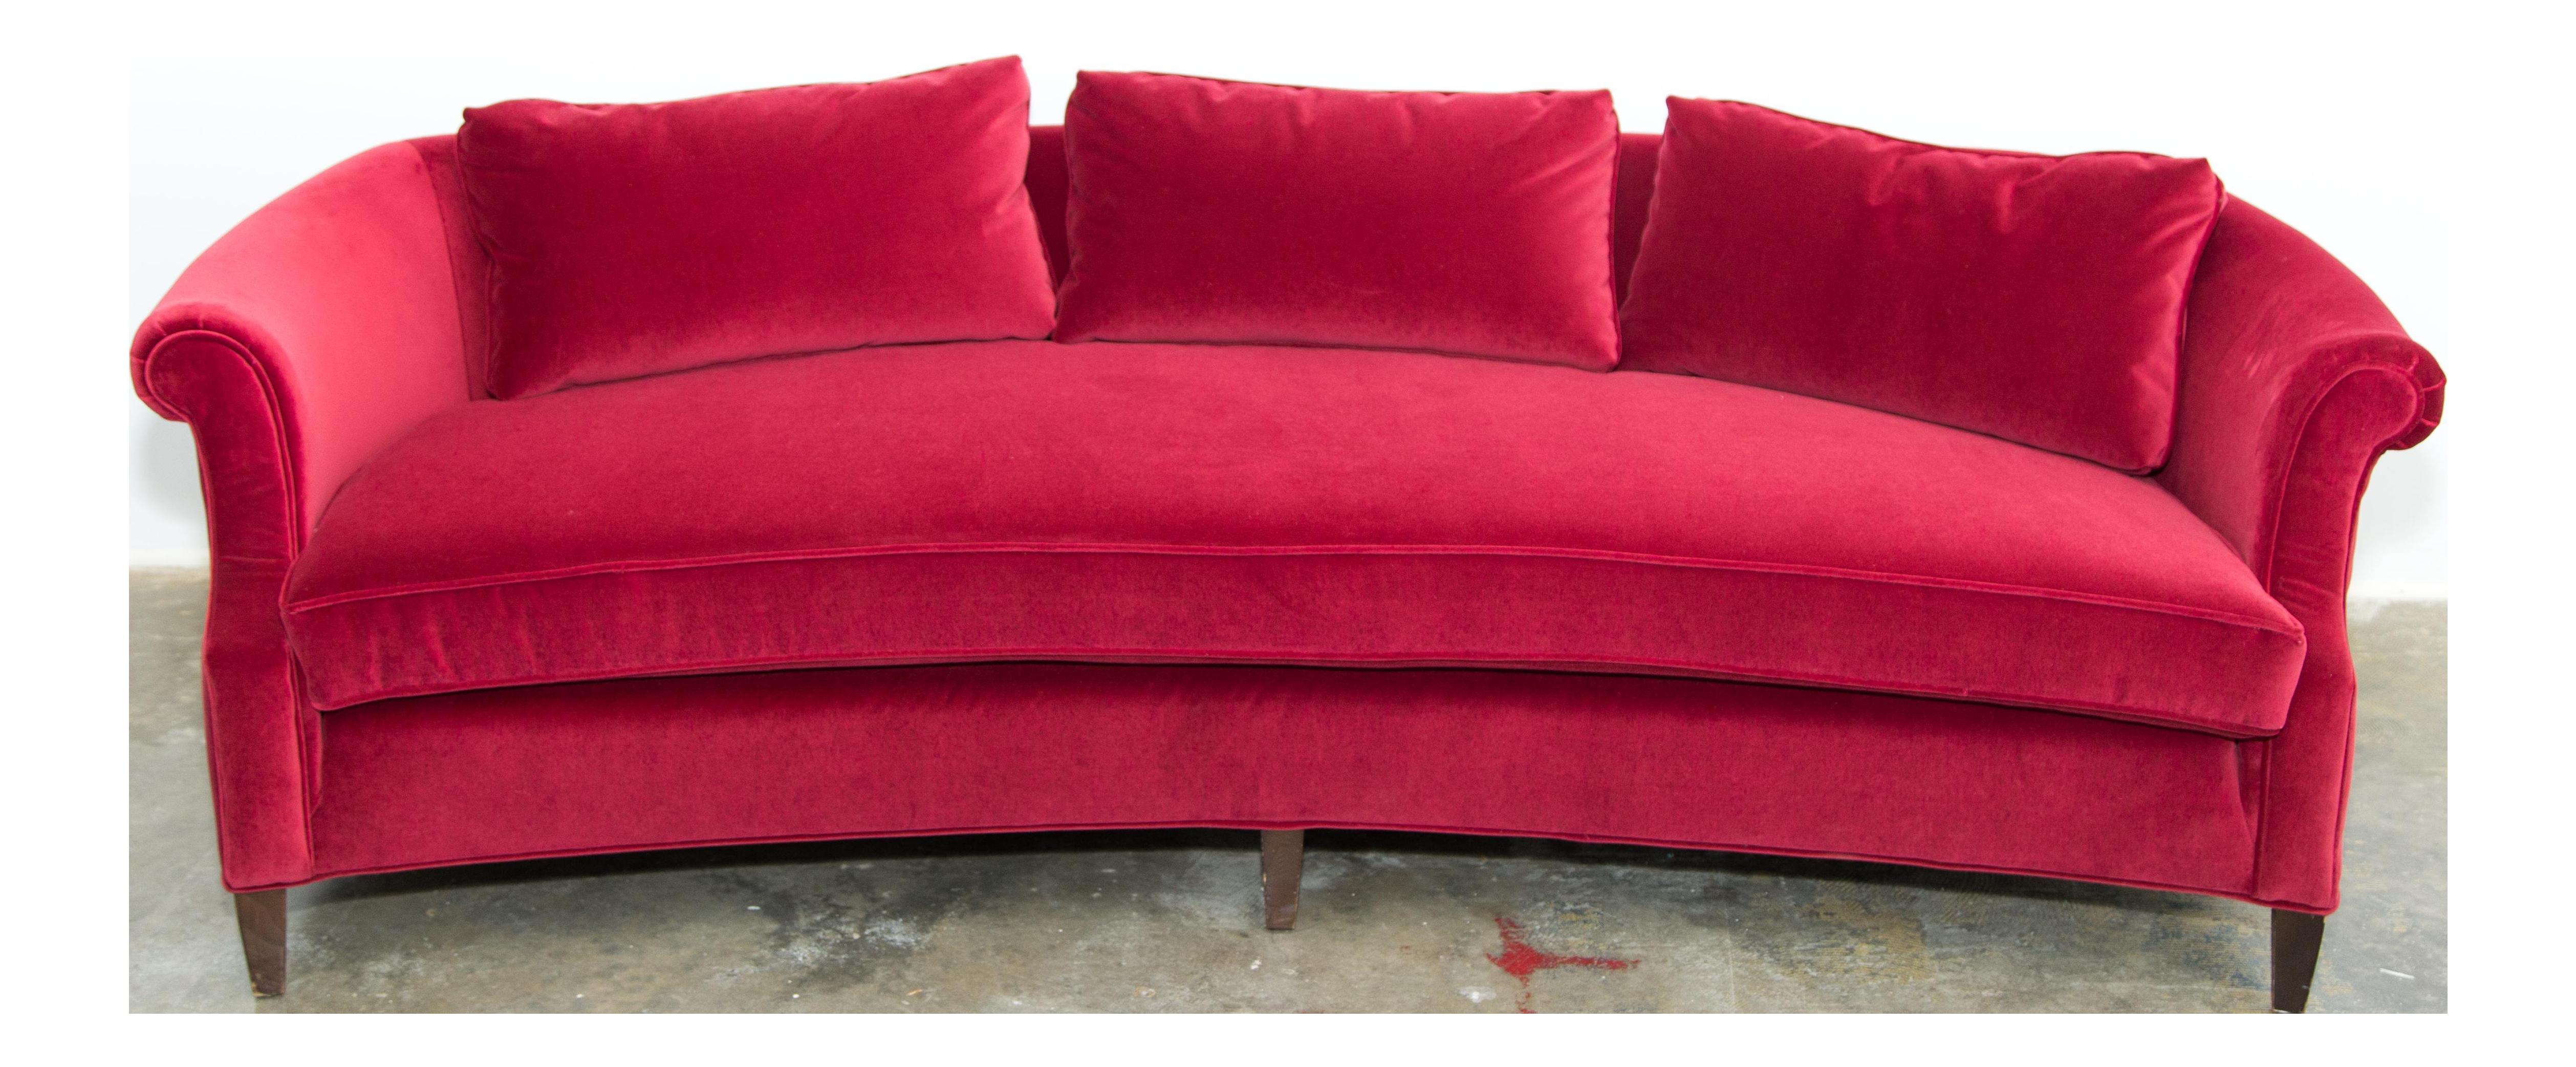 Drexel Heritage Dorothy Draper Sofa in a Luxe Red Velvet Fabric